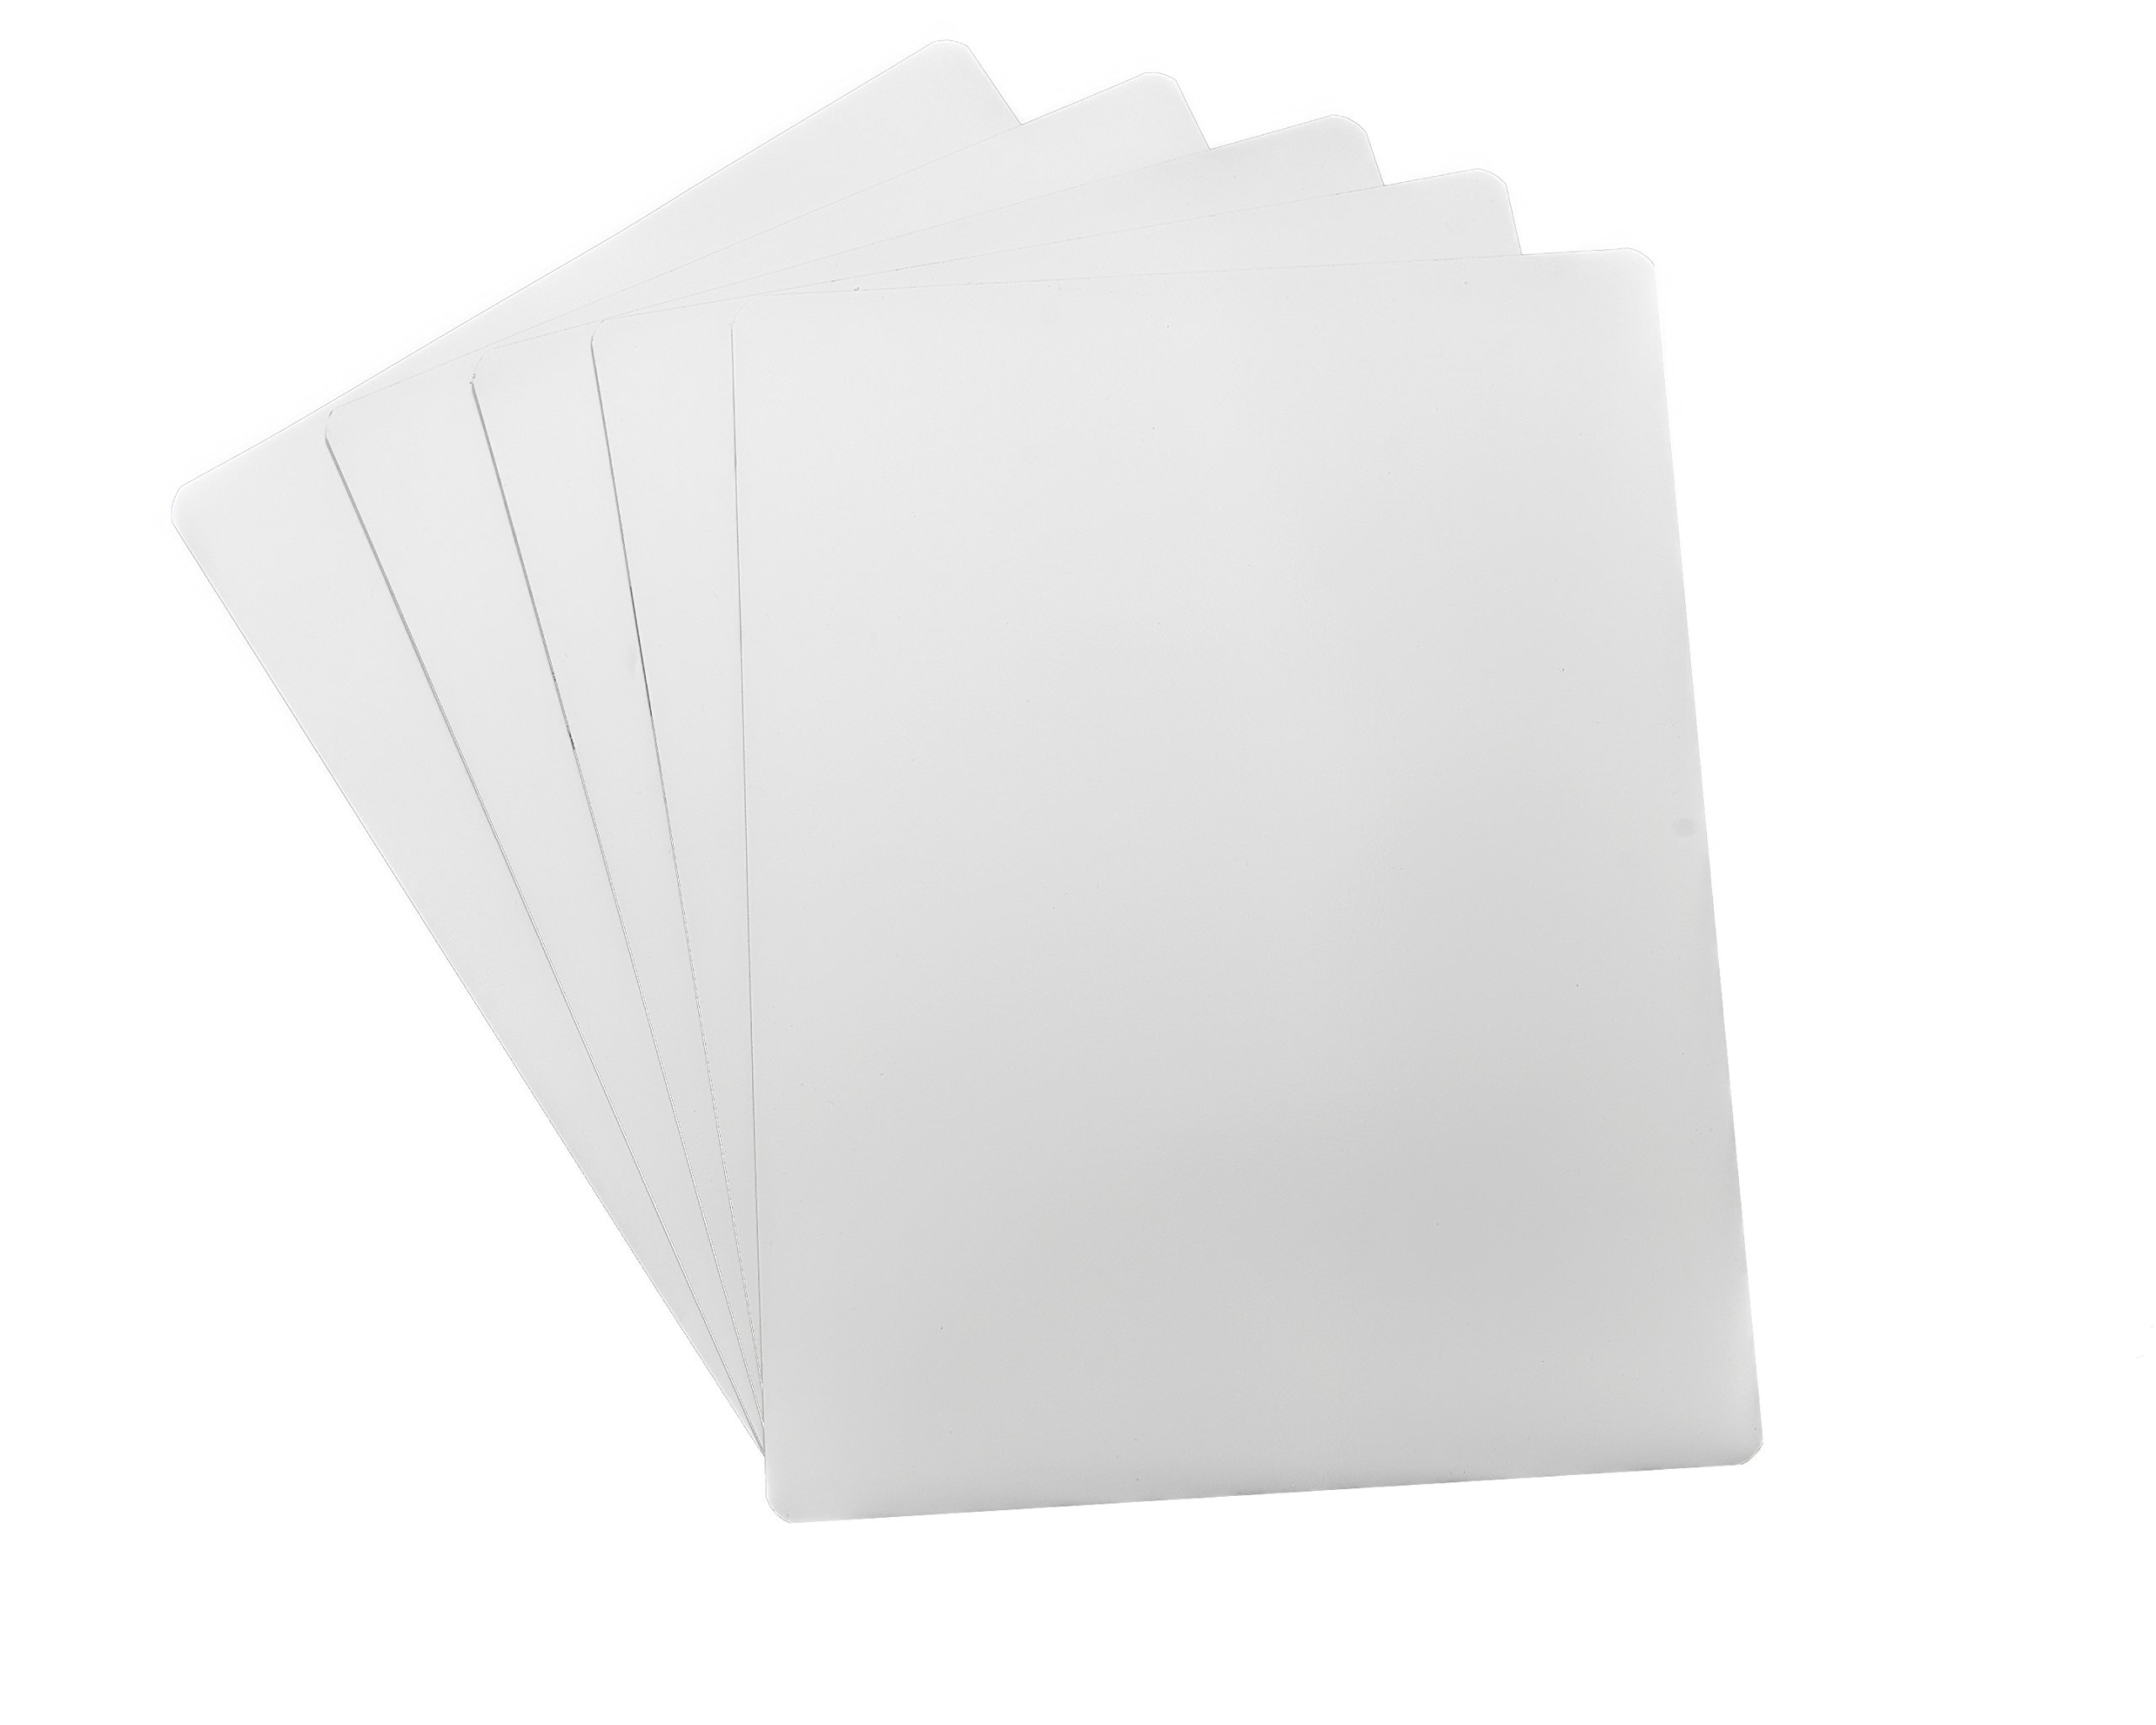 Dry Erase White Magnetic Sheet - 12'' X 18'' - 5 Sheets